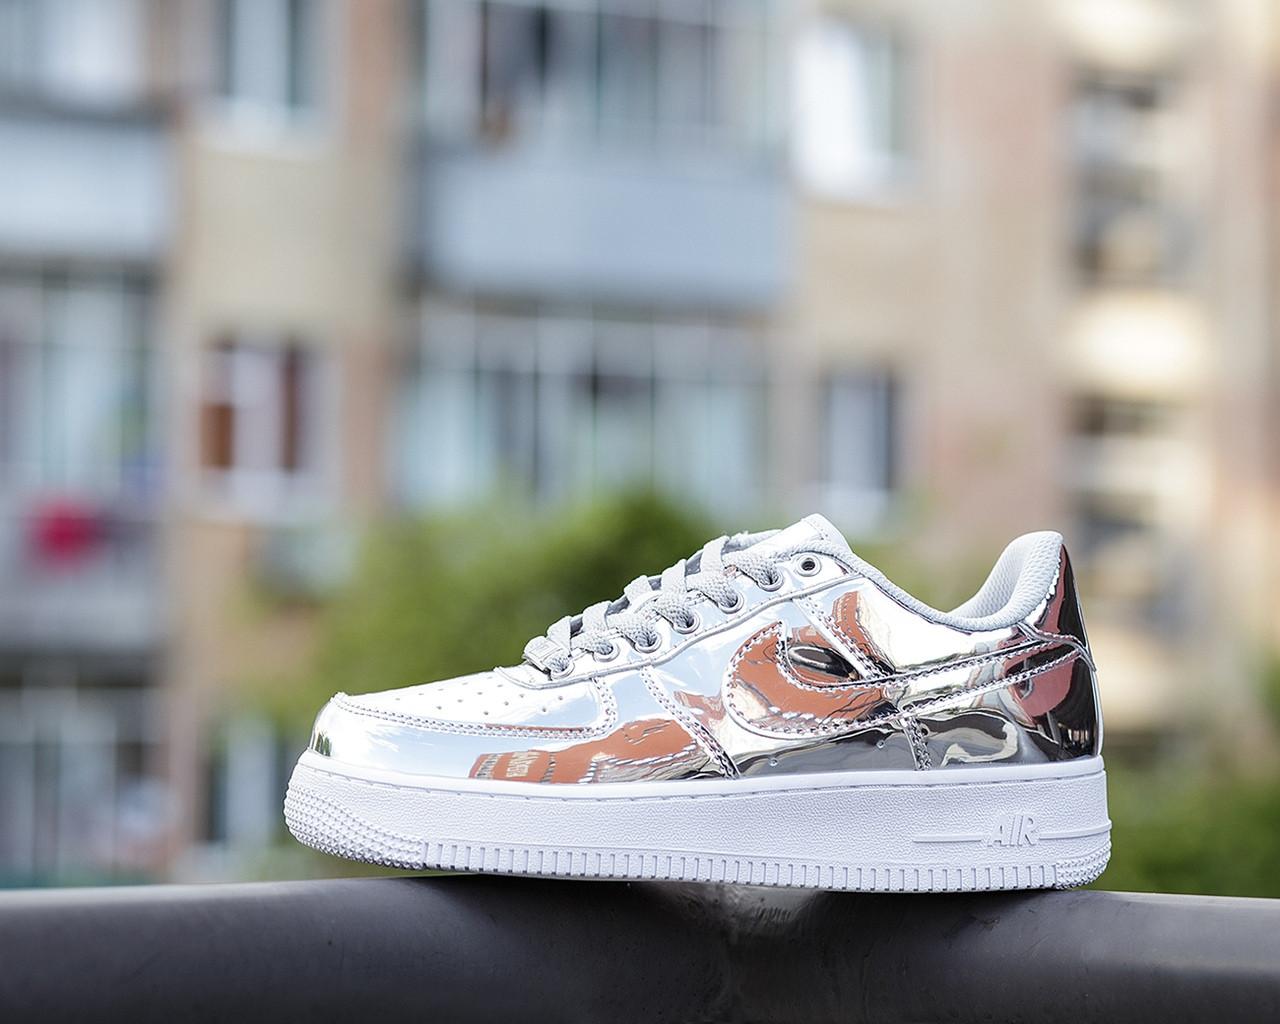 Жіночі кросівки Nike Air Force 1 SP Liquid Metal Silver